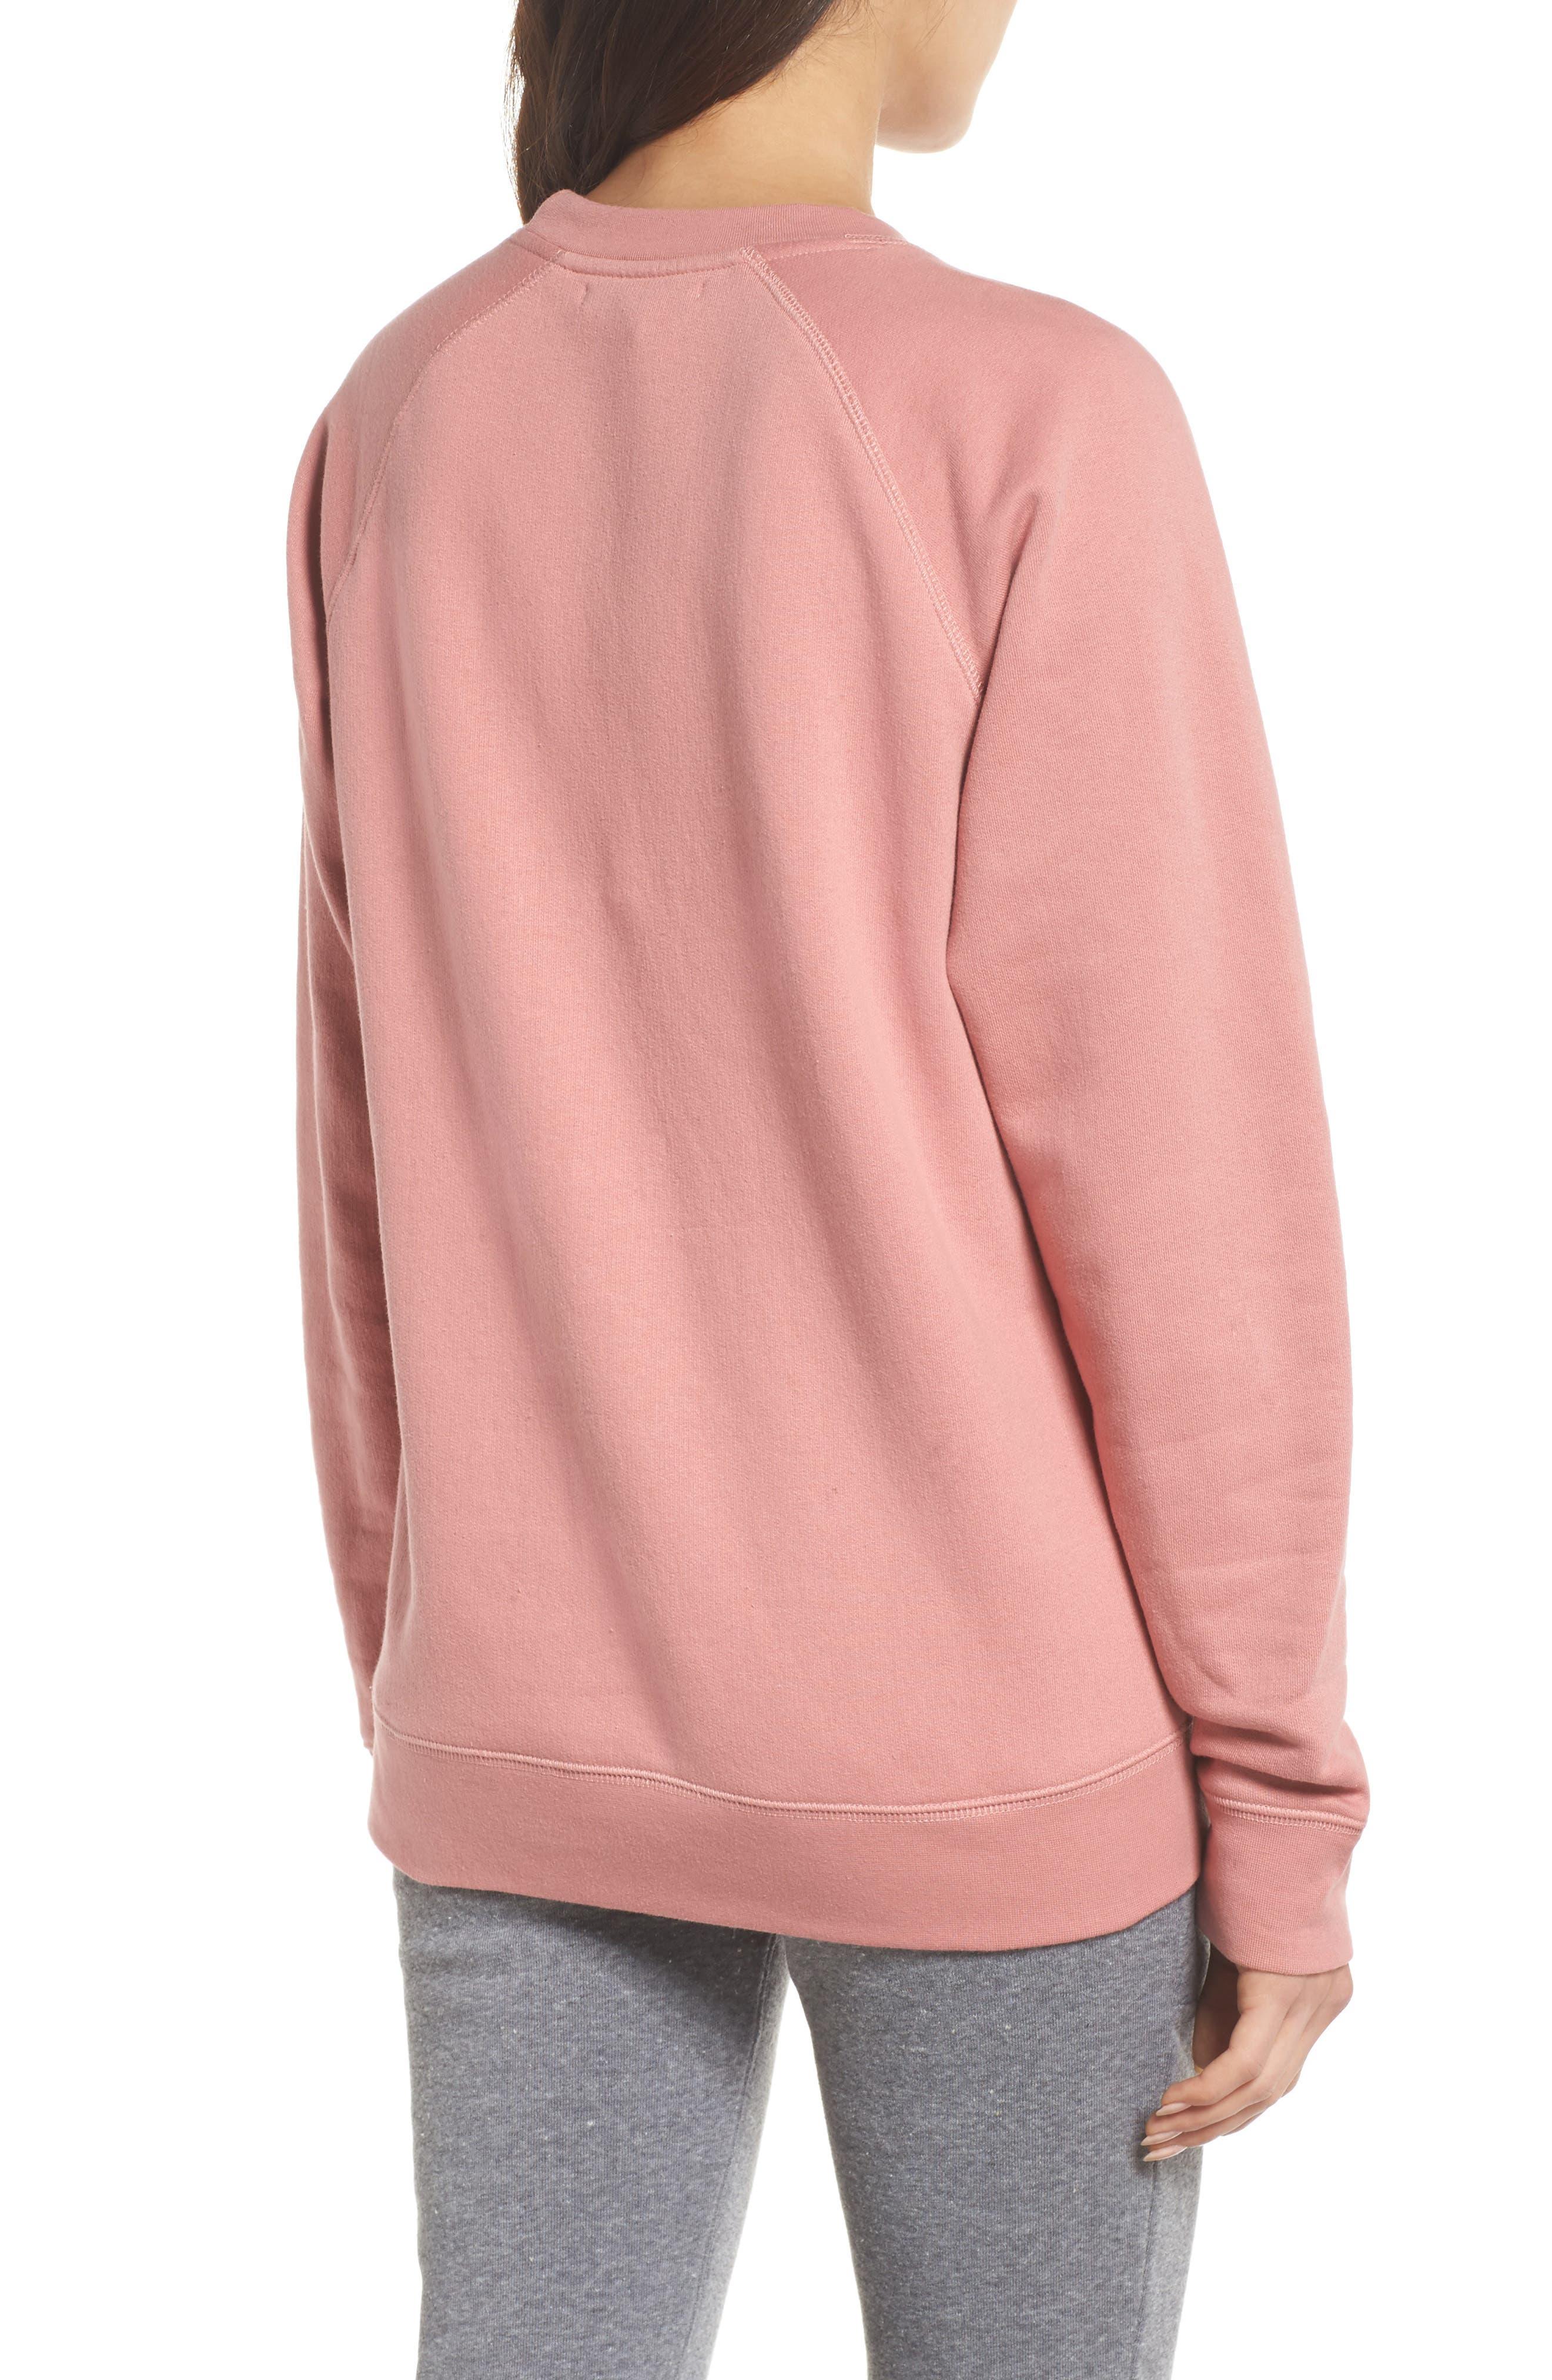 Rosé Okay Sweatshirt,                             Alternate thumbnail 2, color,                             DUSTY ROSE